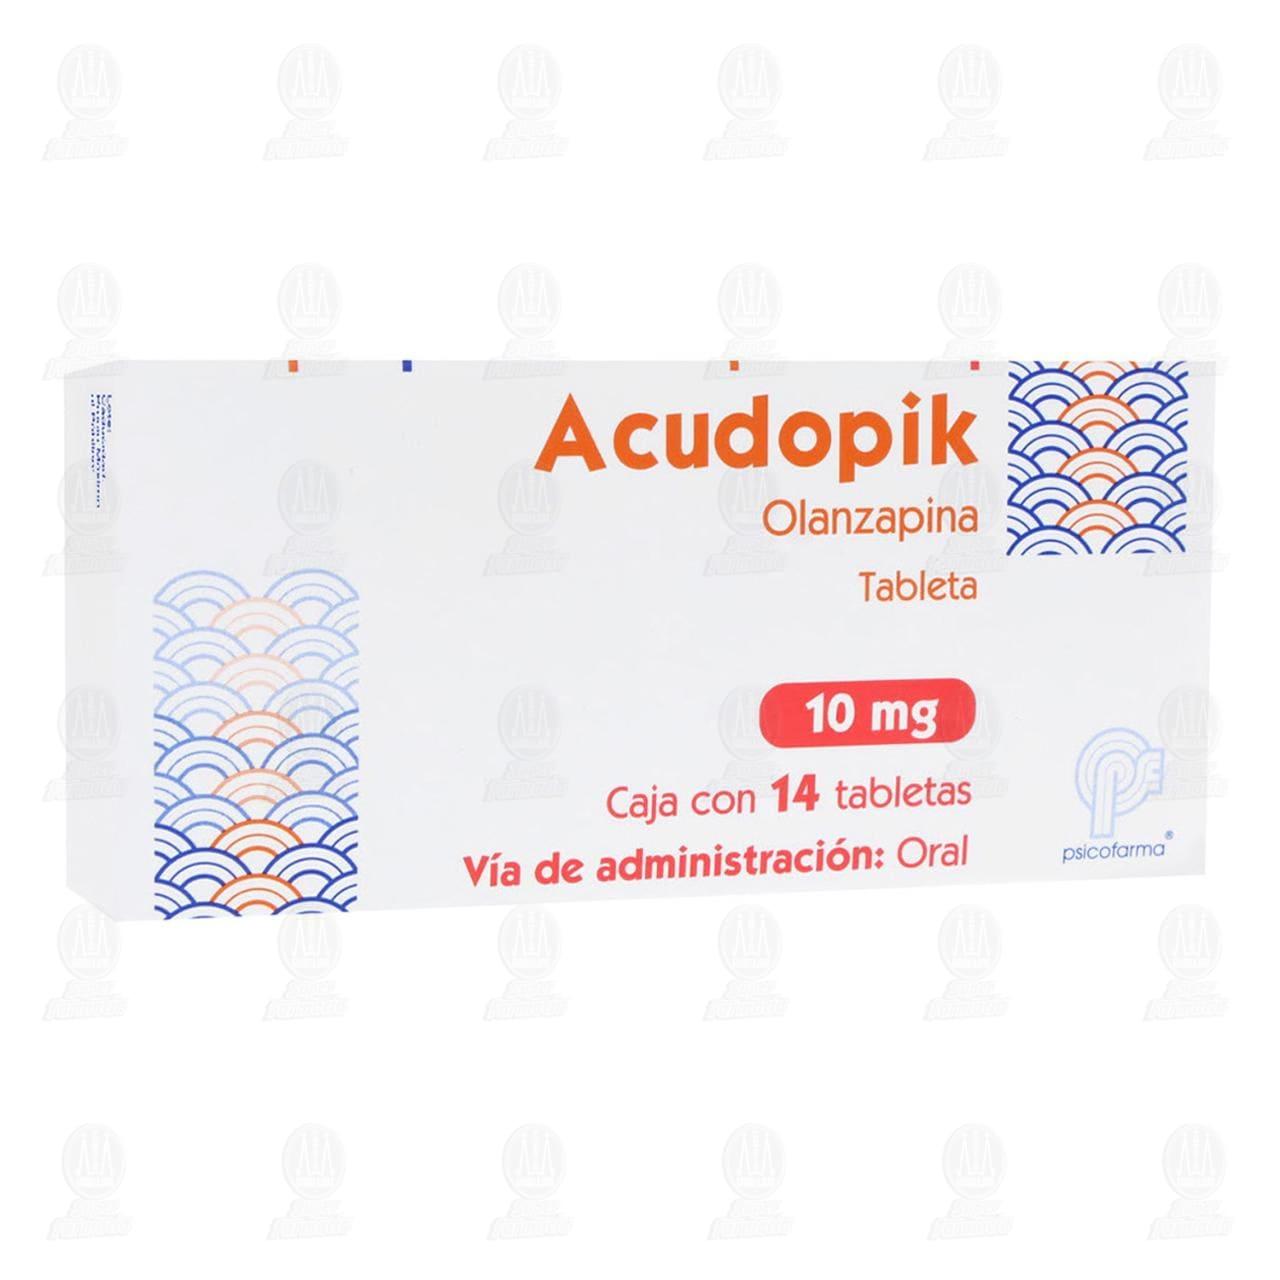 Acudopik 10mg 14 Tabletas